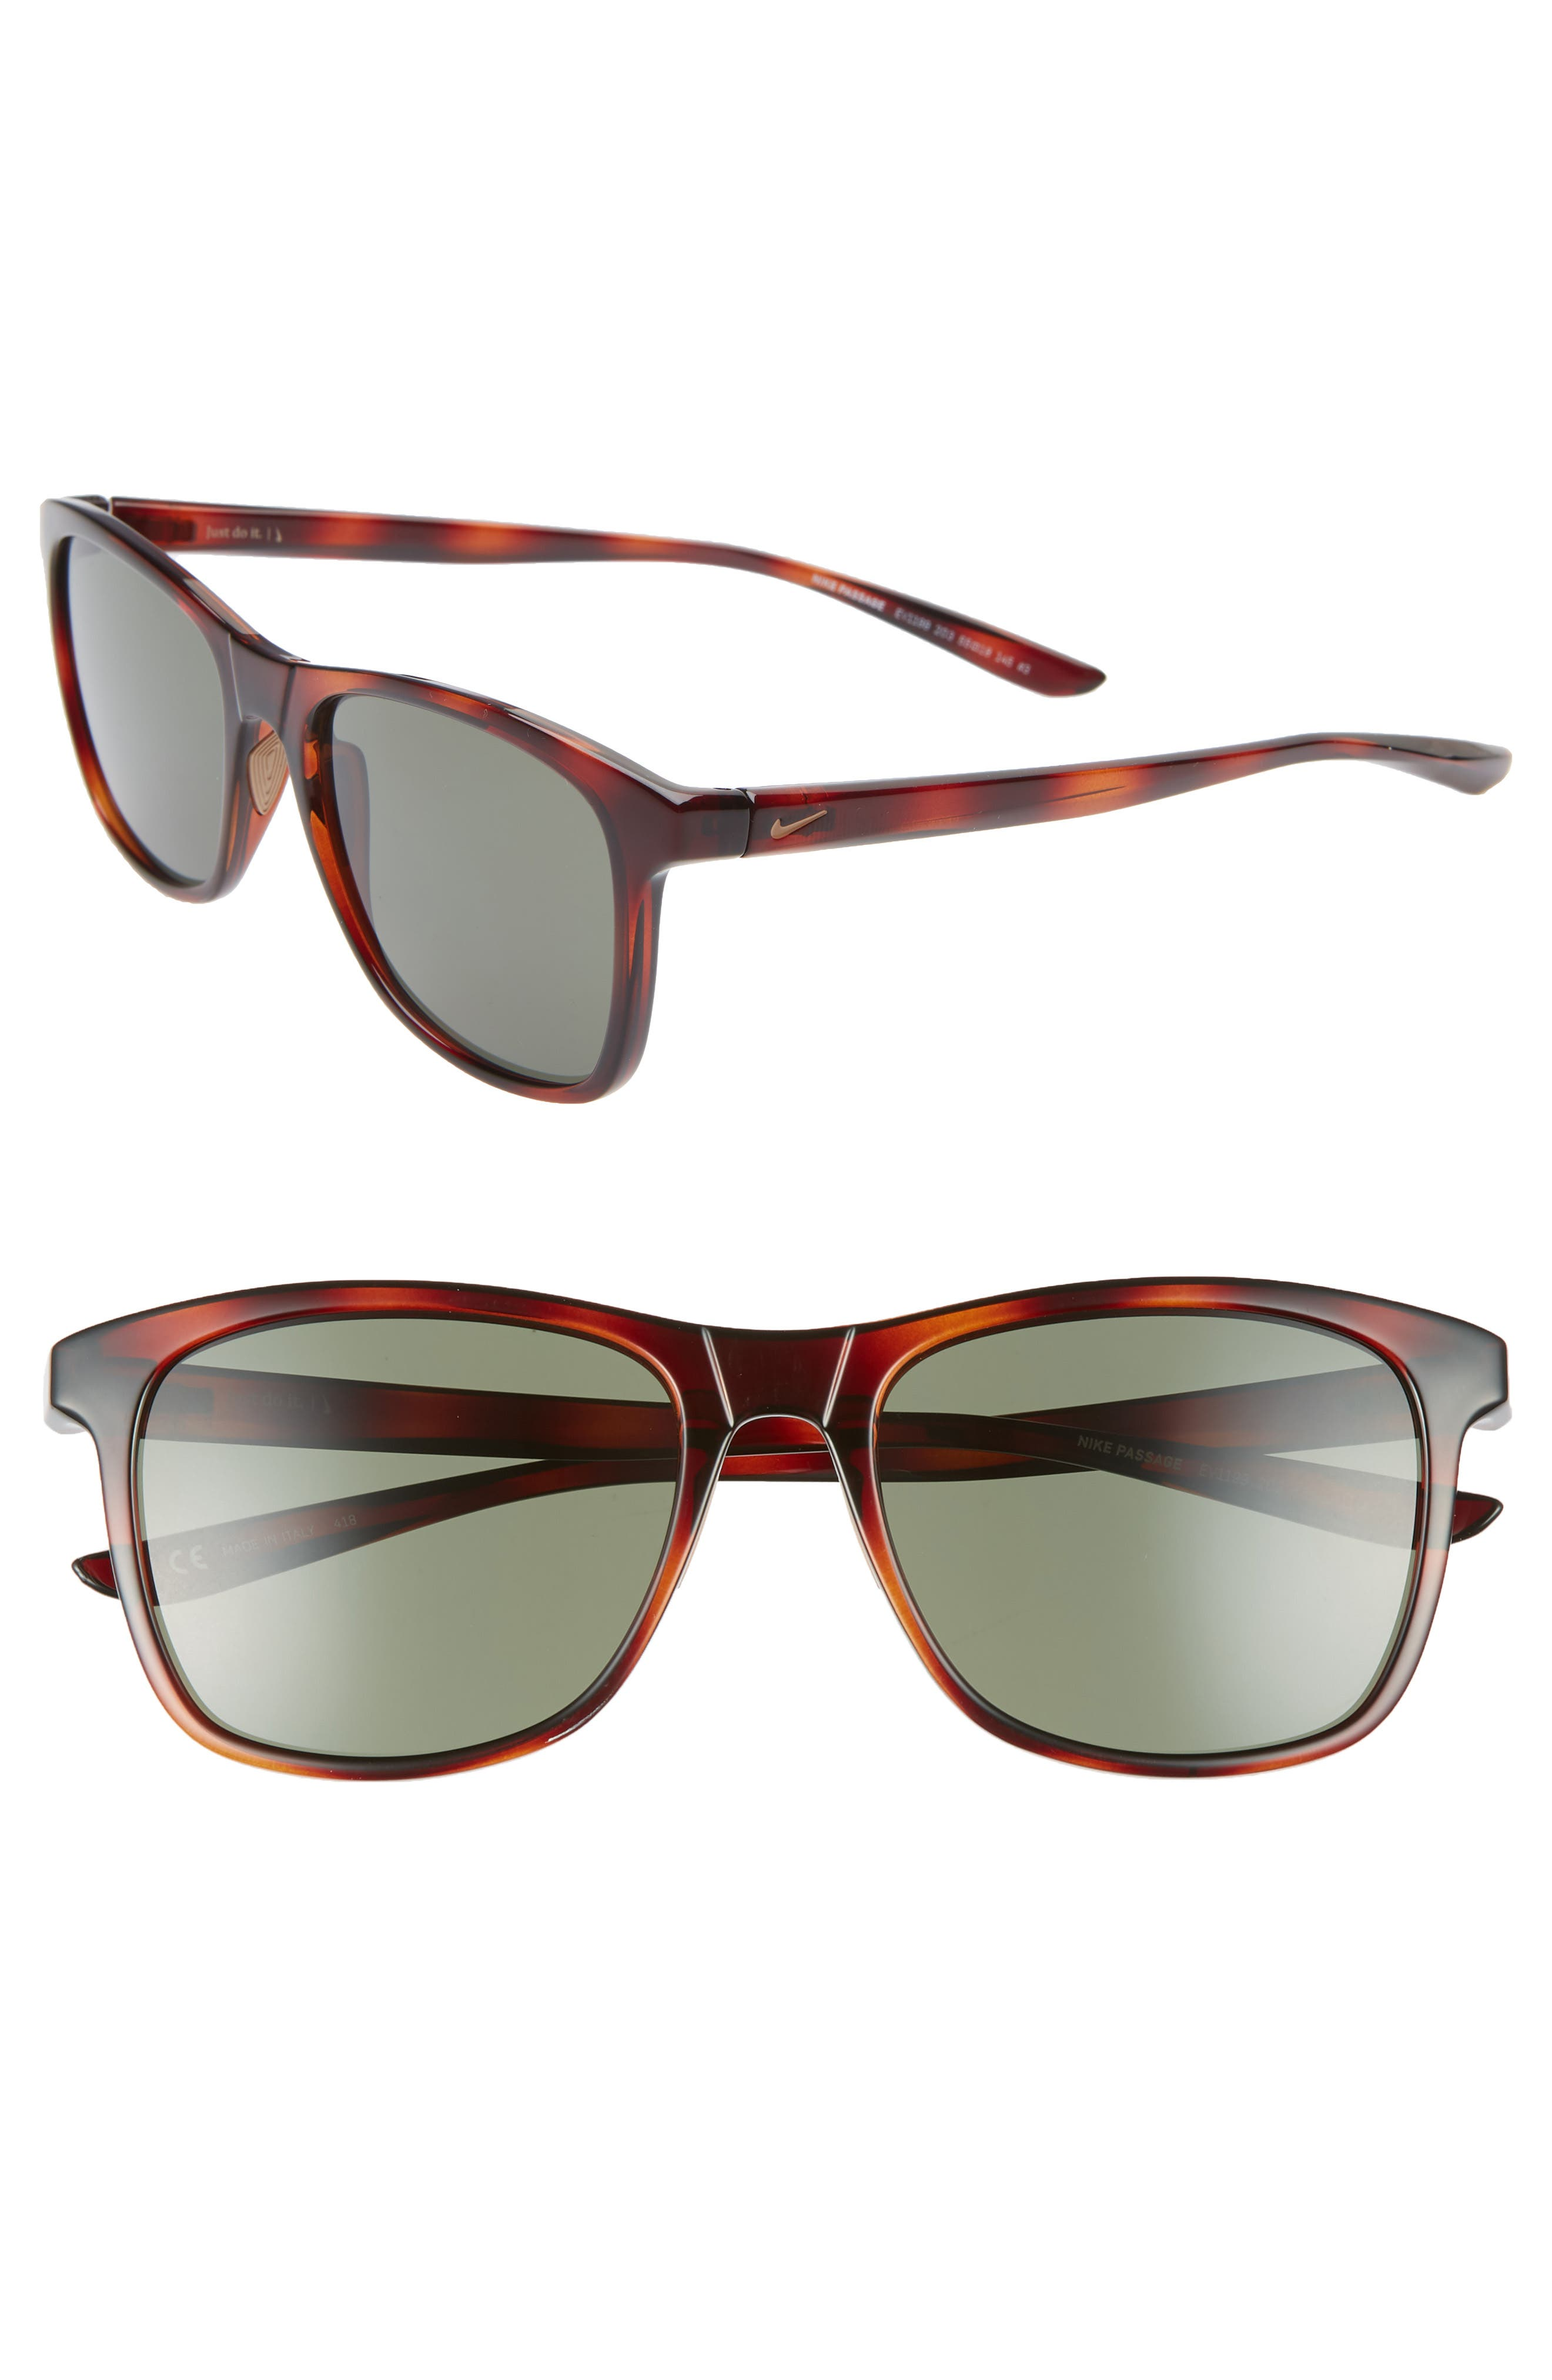 Nike Passage 55Mm Square Sunglasses - Tortoise/ Green